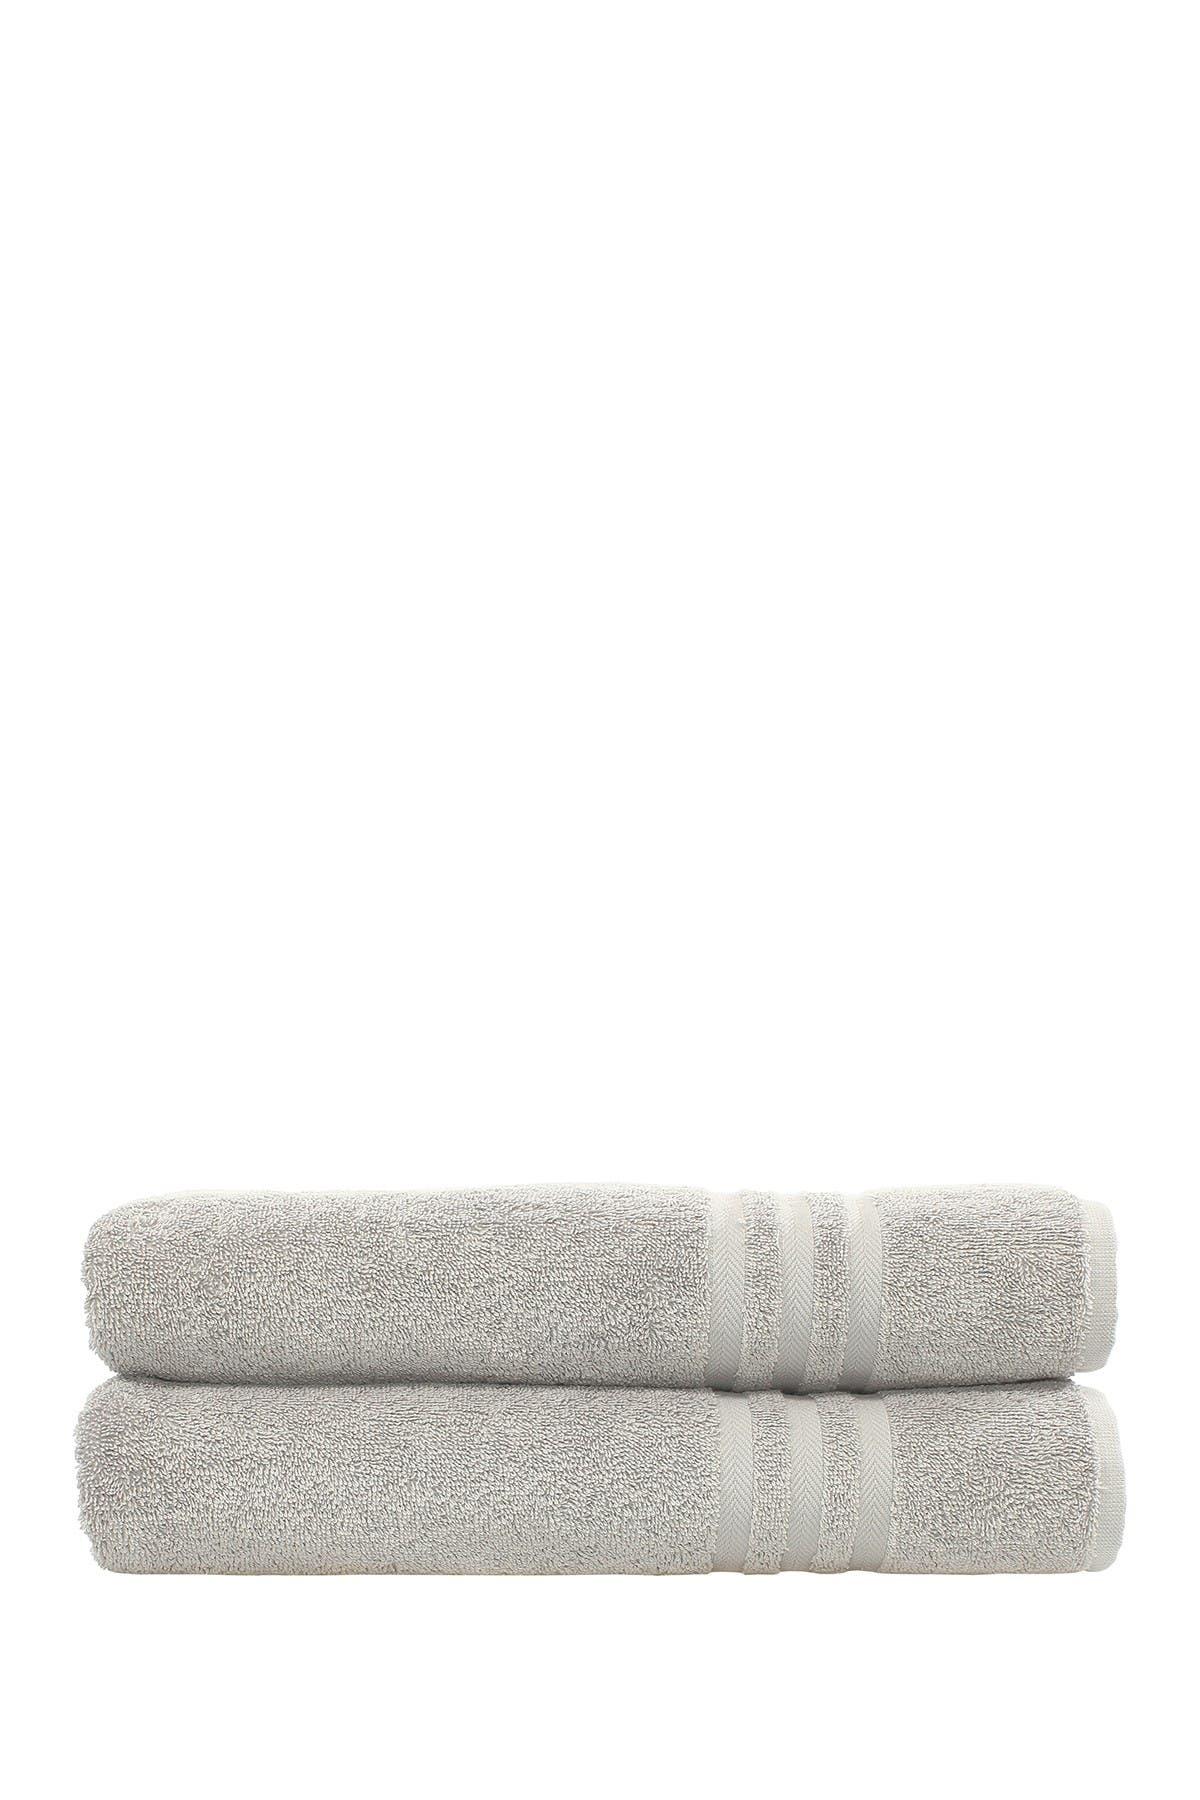 Image of LINUM HOME Denzi Bath Towels - Set of 2 - Grey